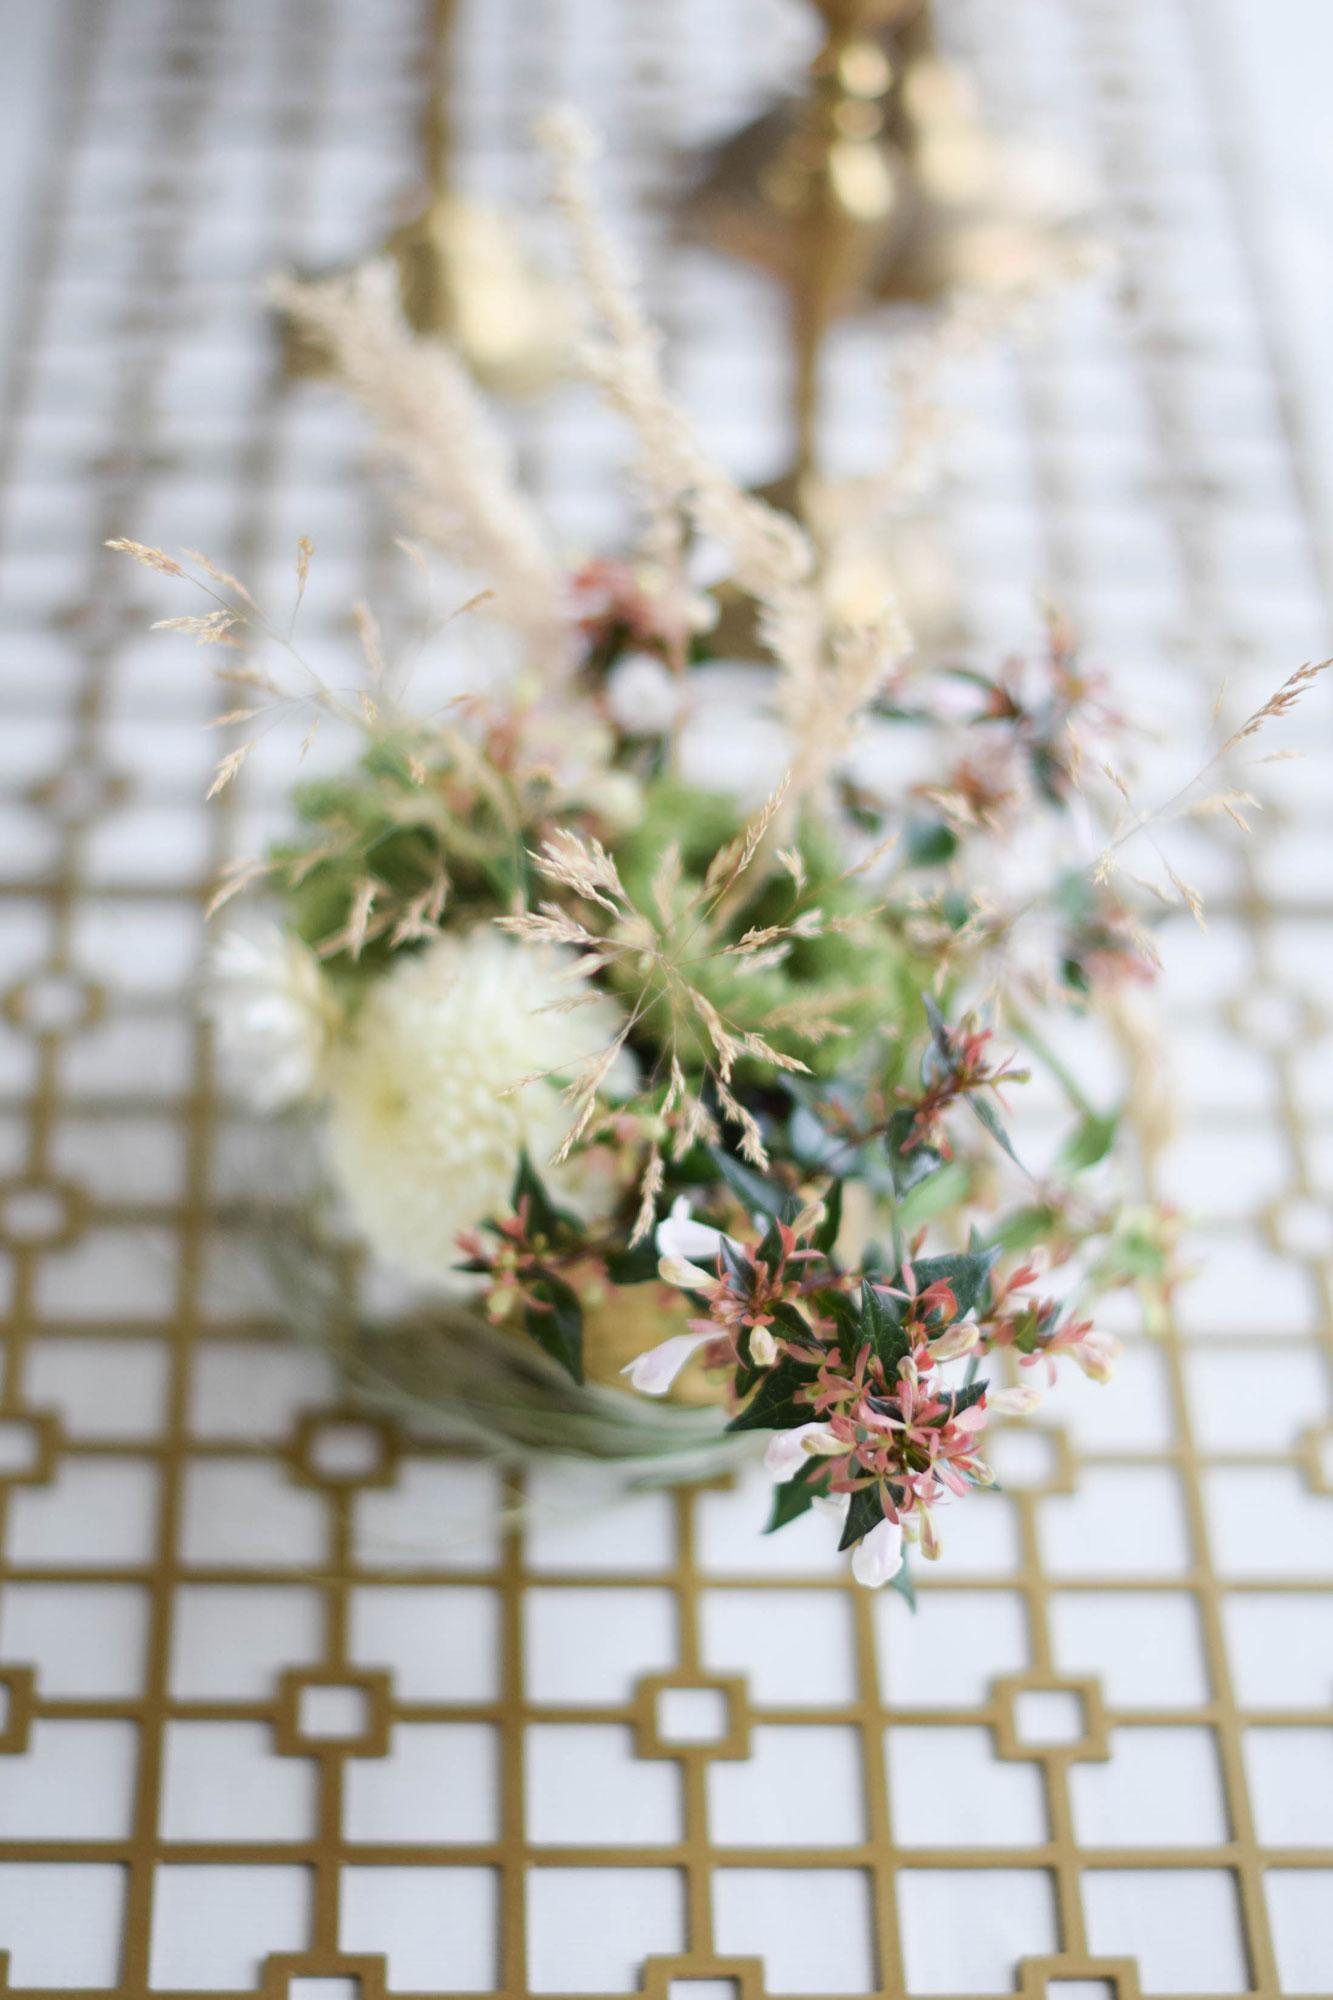 BBJ-Photoshoot--Curious-Lola--Flower-small-(3)